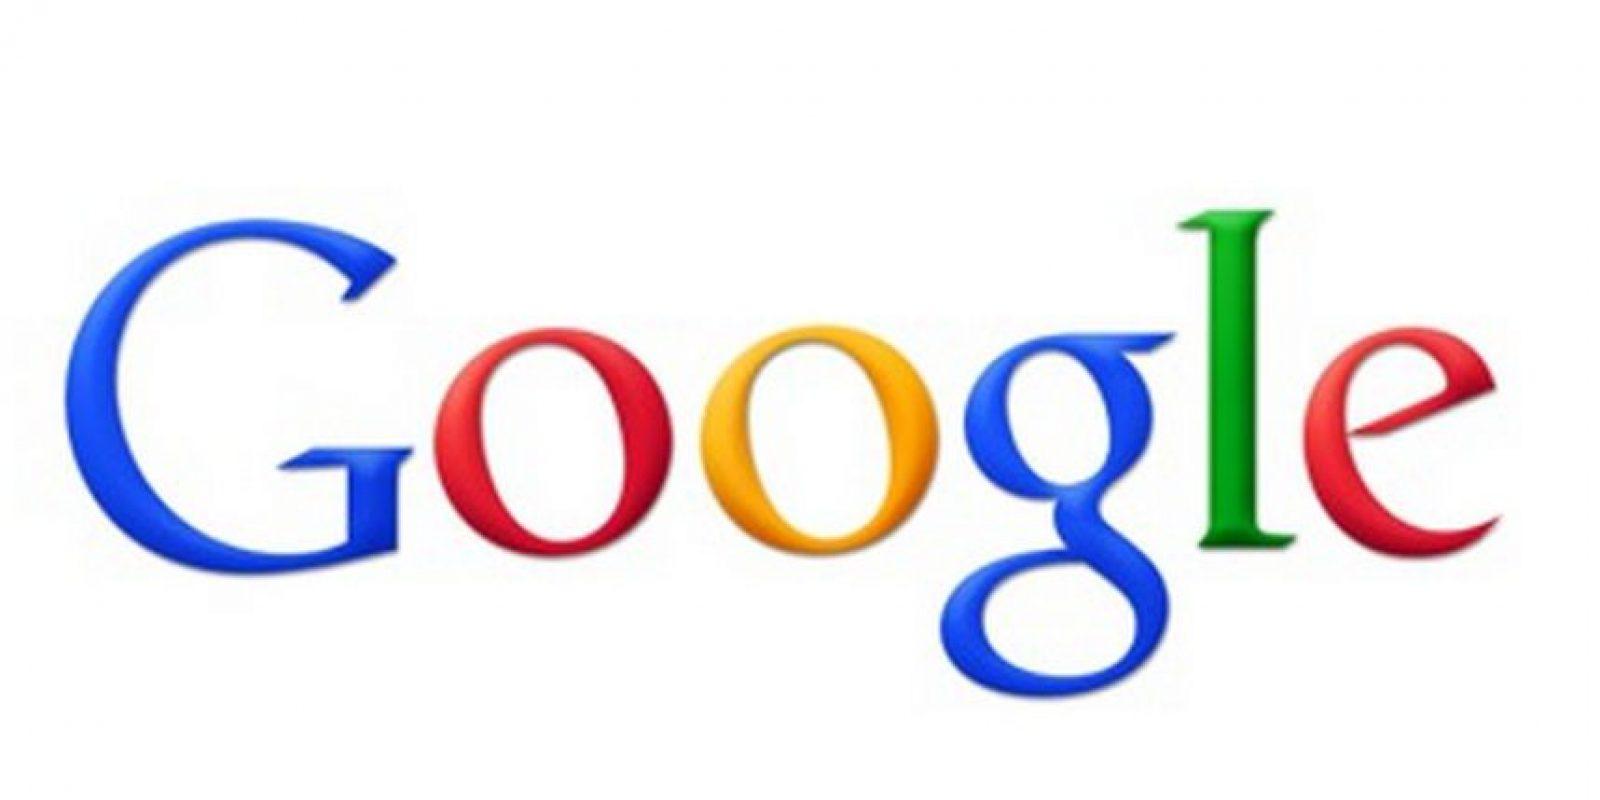 Google tres estrellas Foto:Google